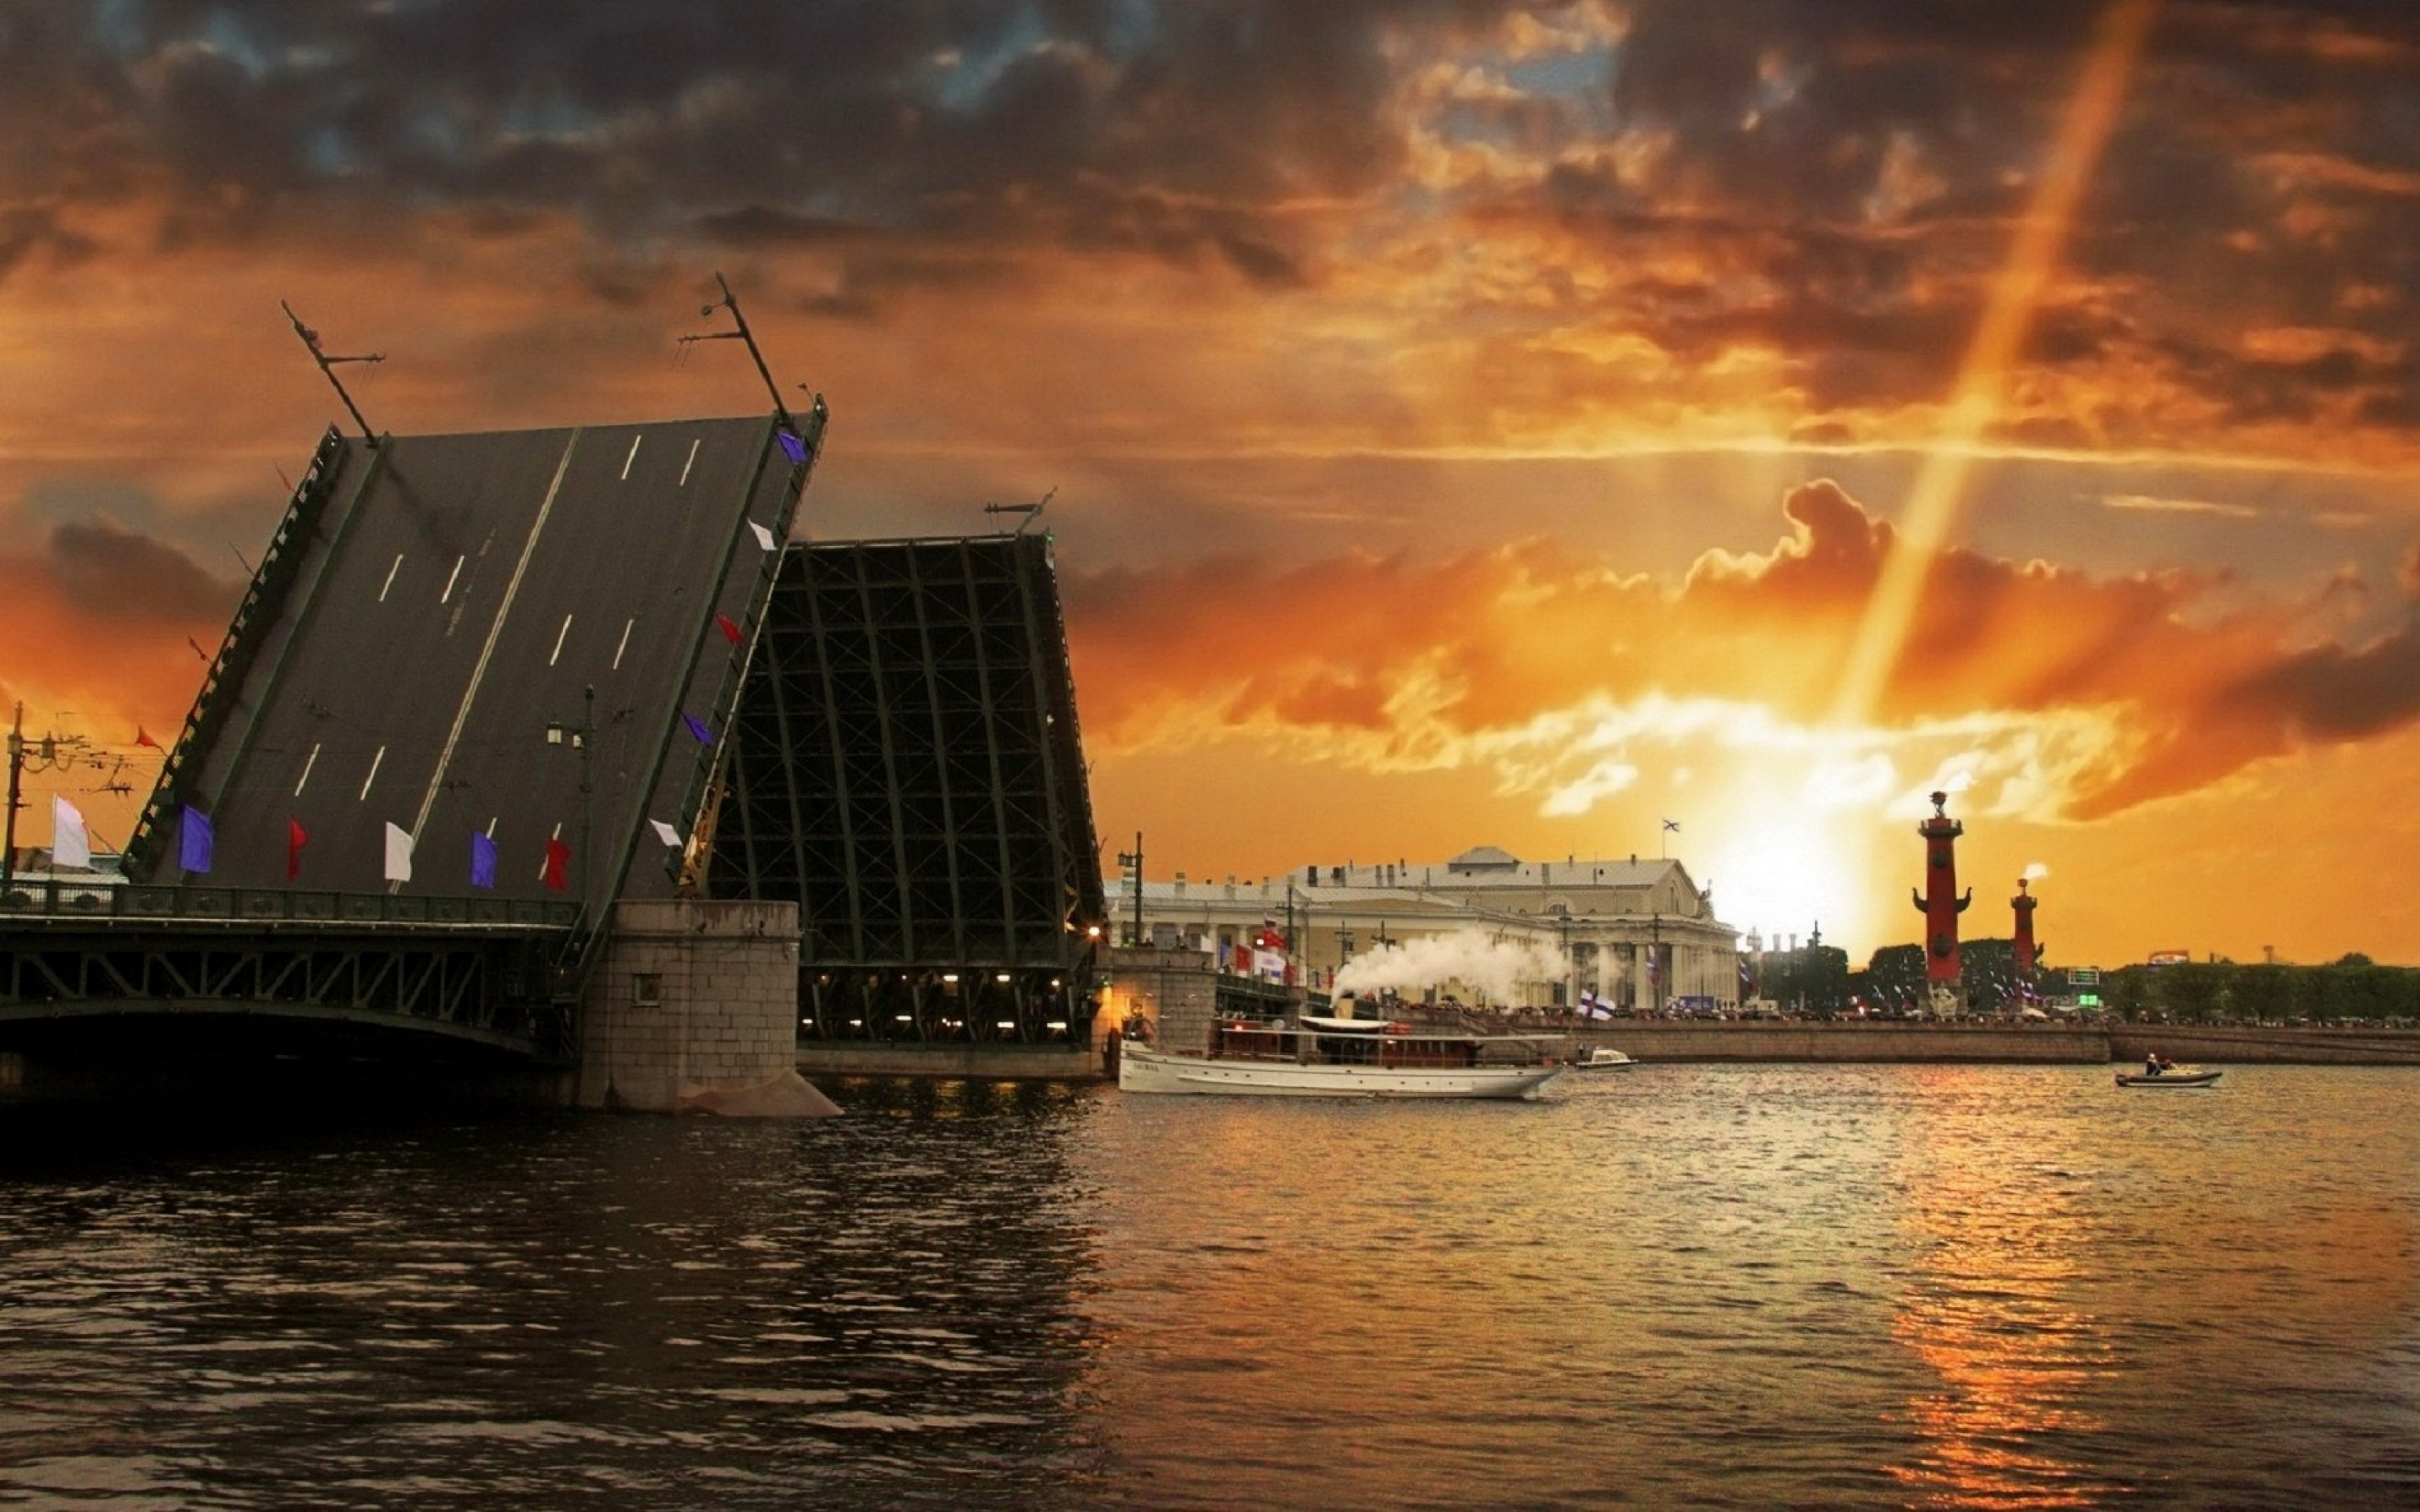 Man Made Saint Petersburg 3840x2400